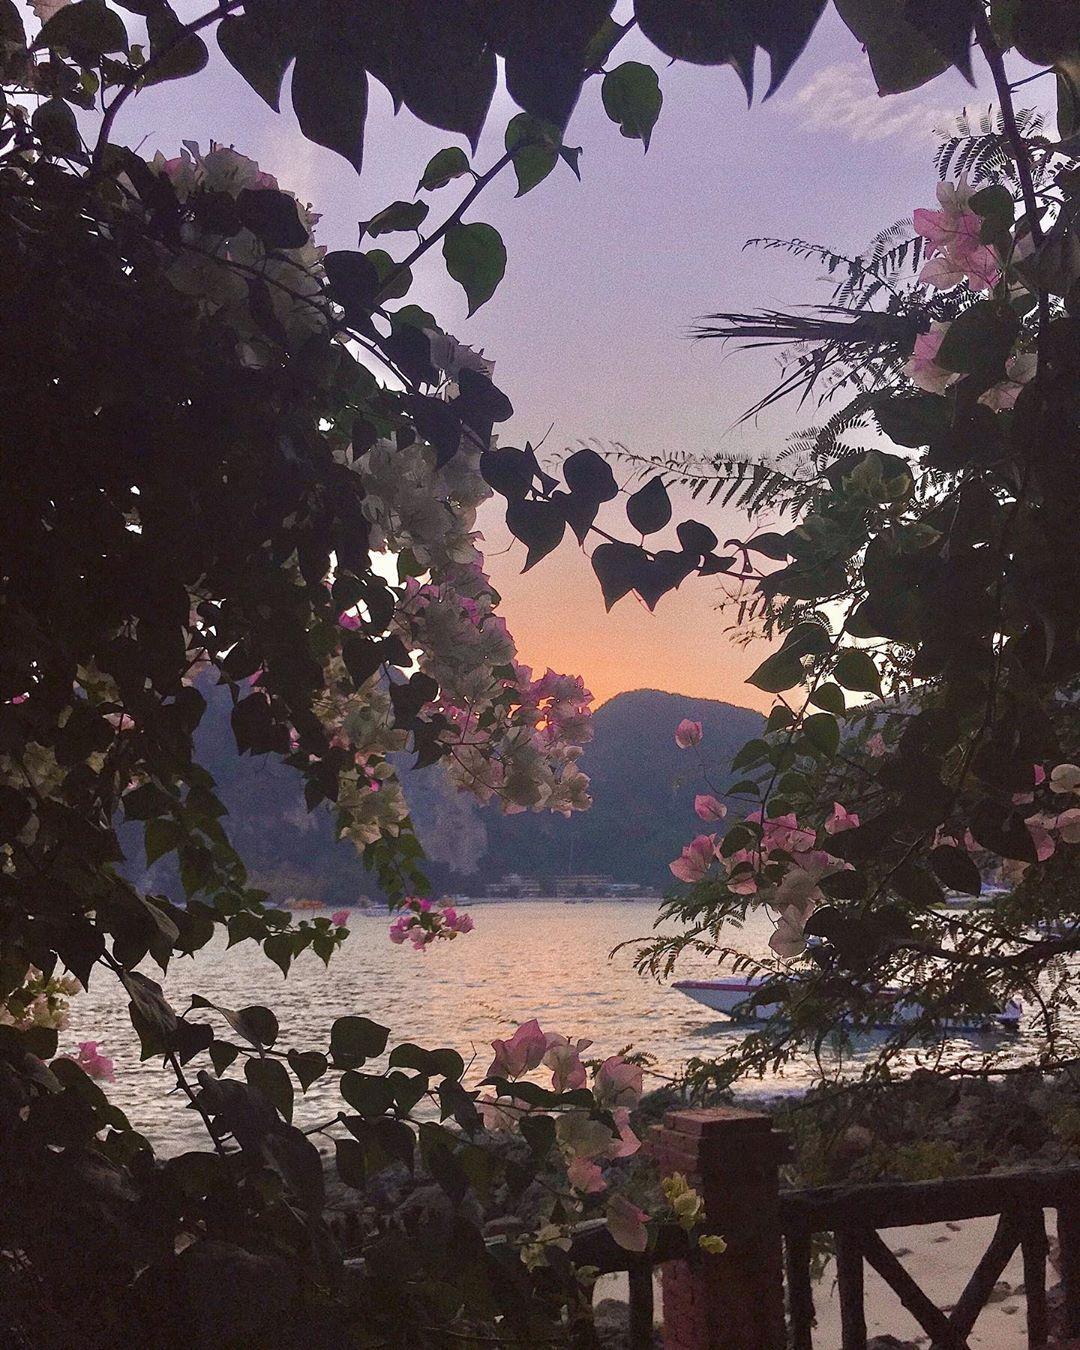 ʜᴇᴀᴠᴇɴ ıs ᴀ ᴘʟᴀᴄᴇ ᴏɴ ᴇᴀʀᴛʜ 🔮 . . . . . . . #love #heavenonearth #summernights #vacation #mood #pastel #agameoftones #su...